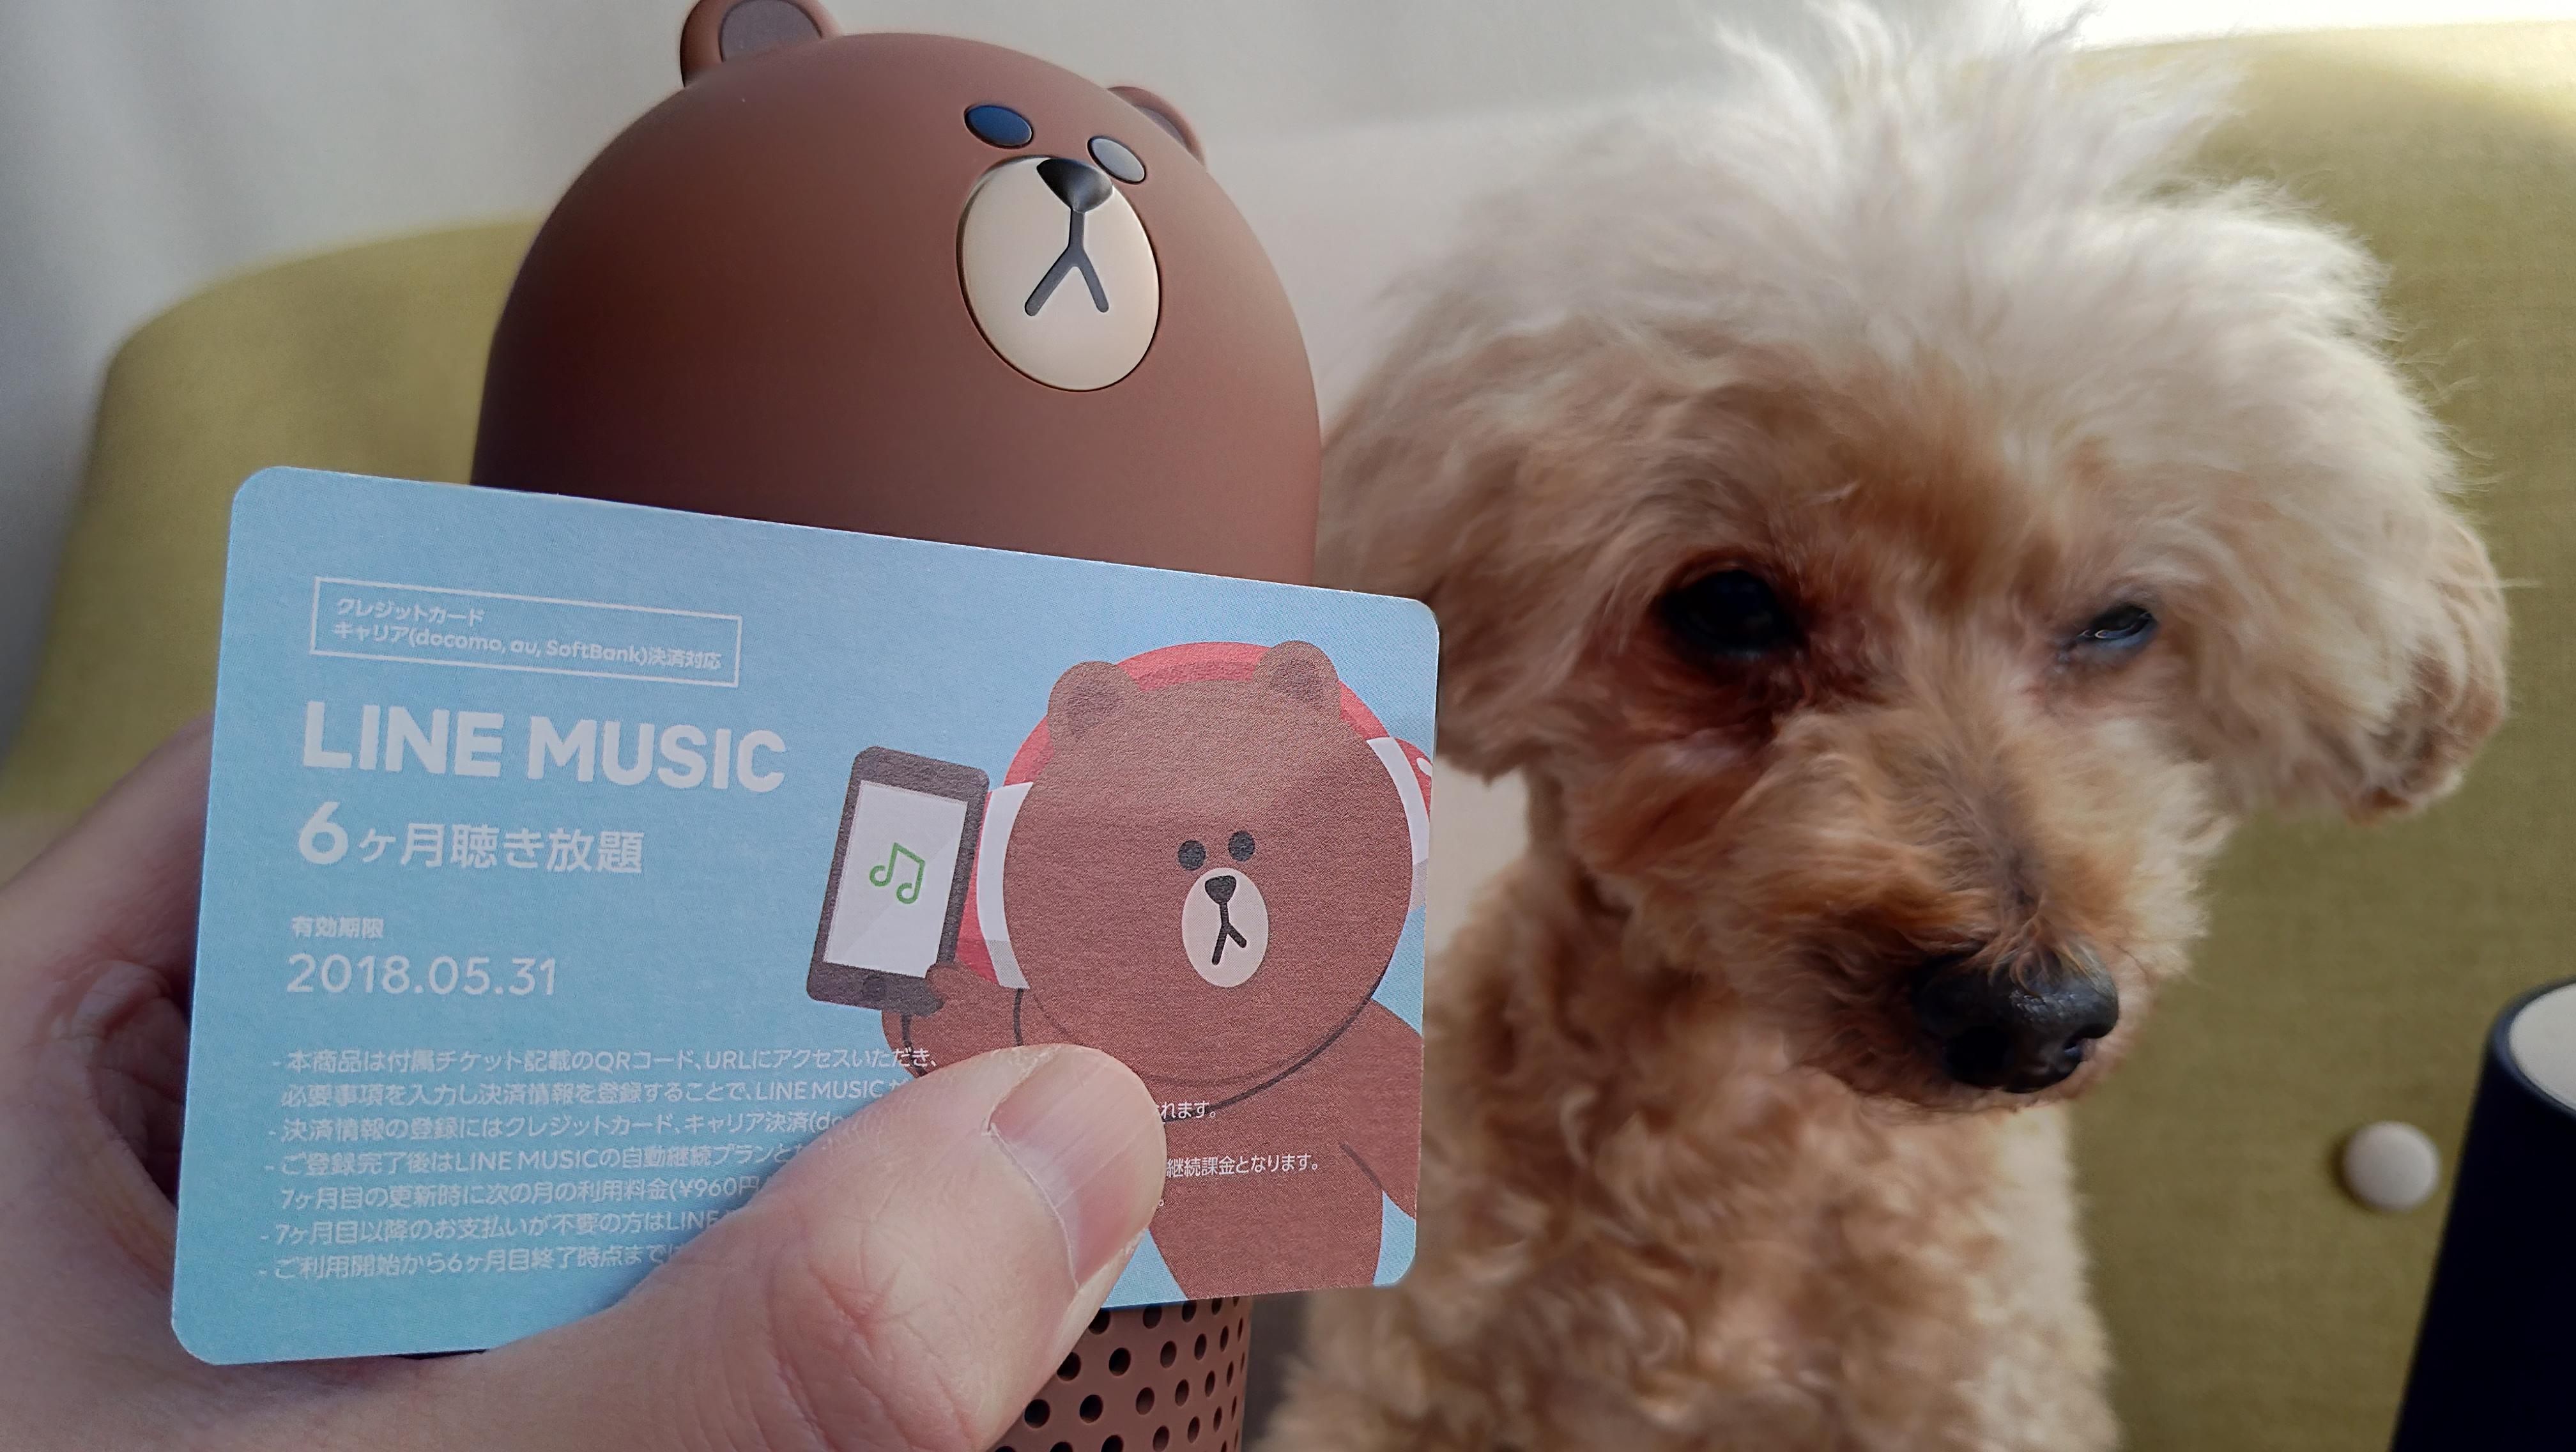 LINE MUSIC 6ヶ月聴き放題付